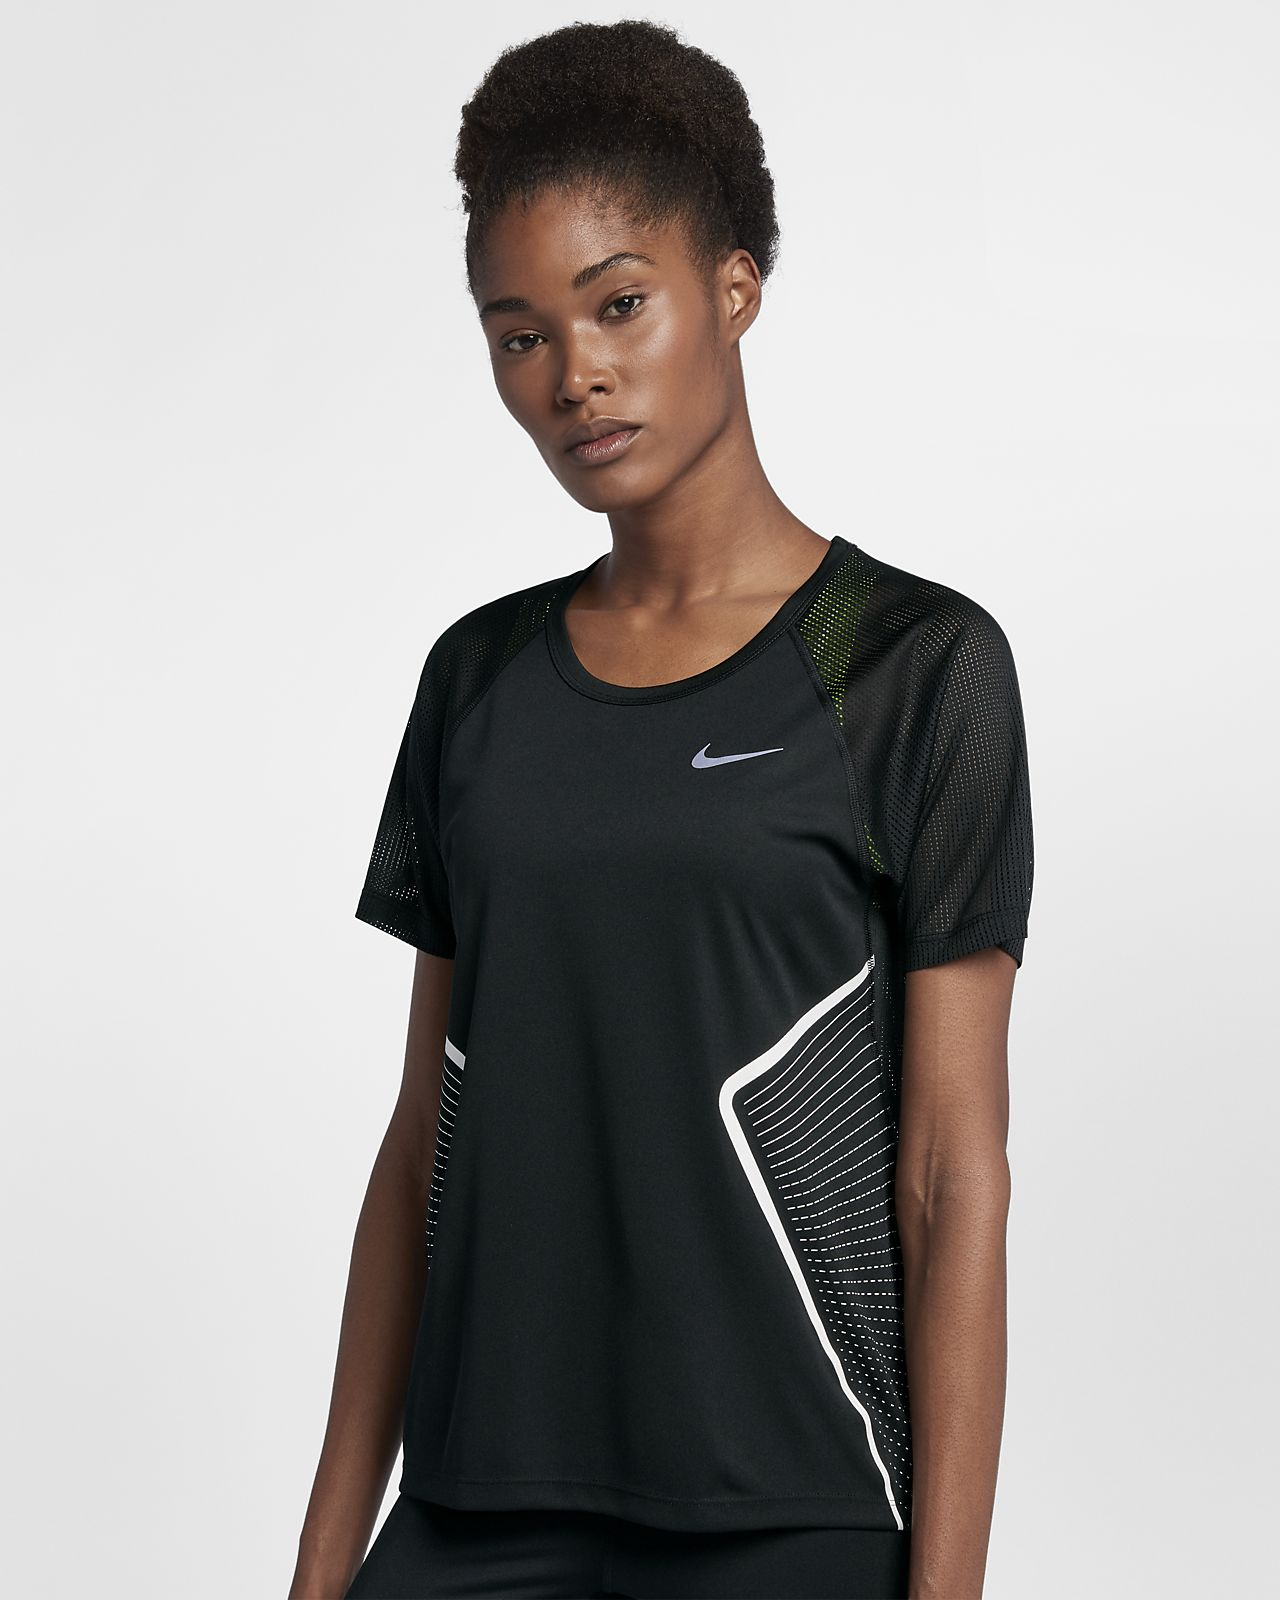 ... Nike Dri-FIT Miler Women's Short Sleeve Running Top